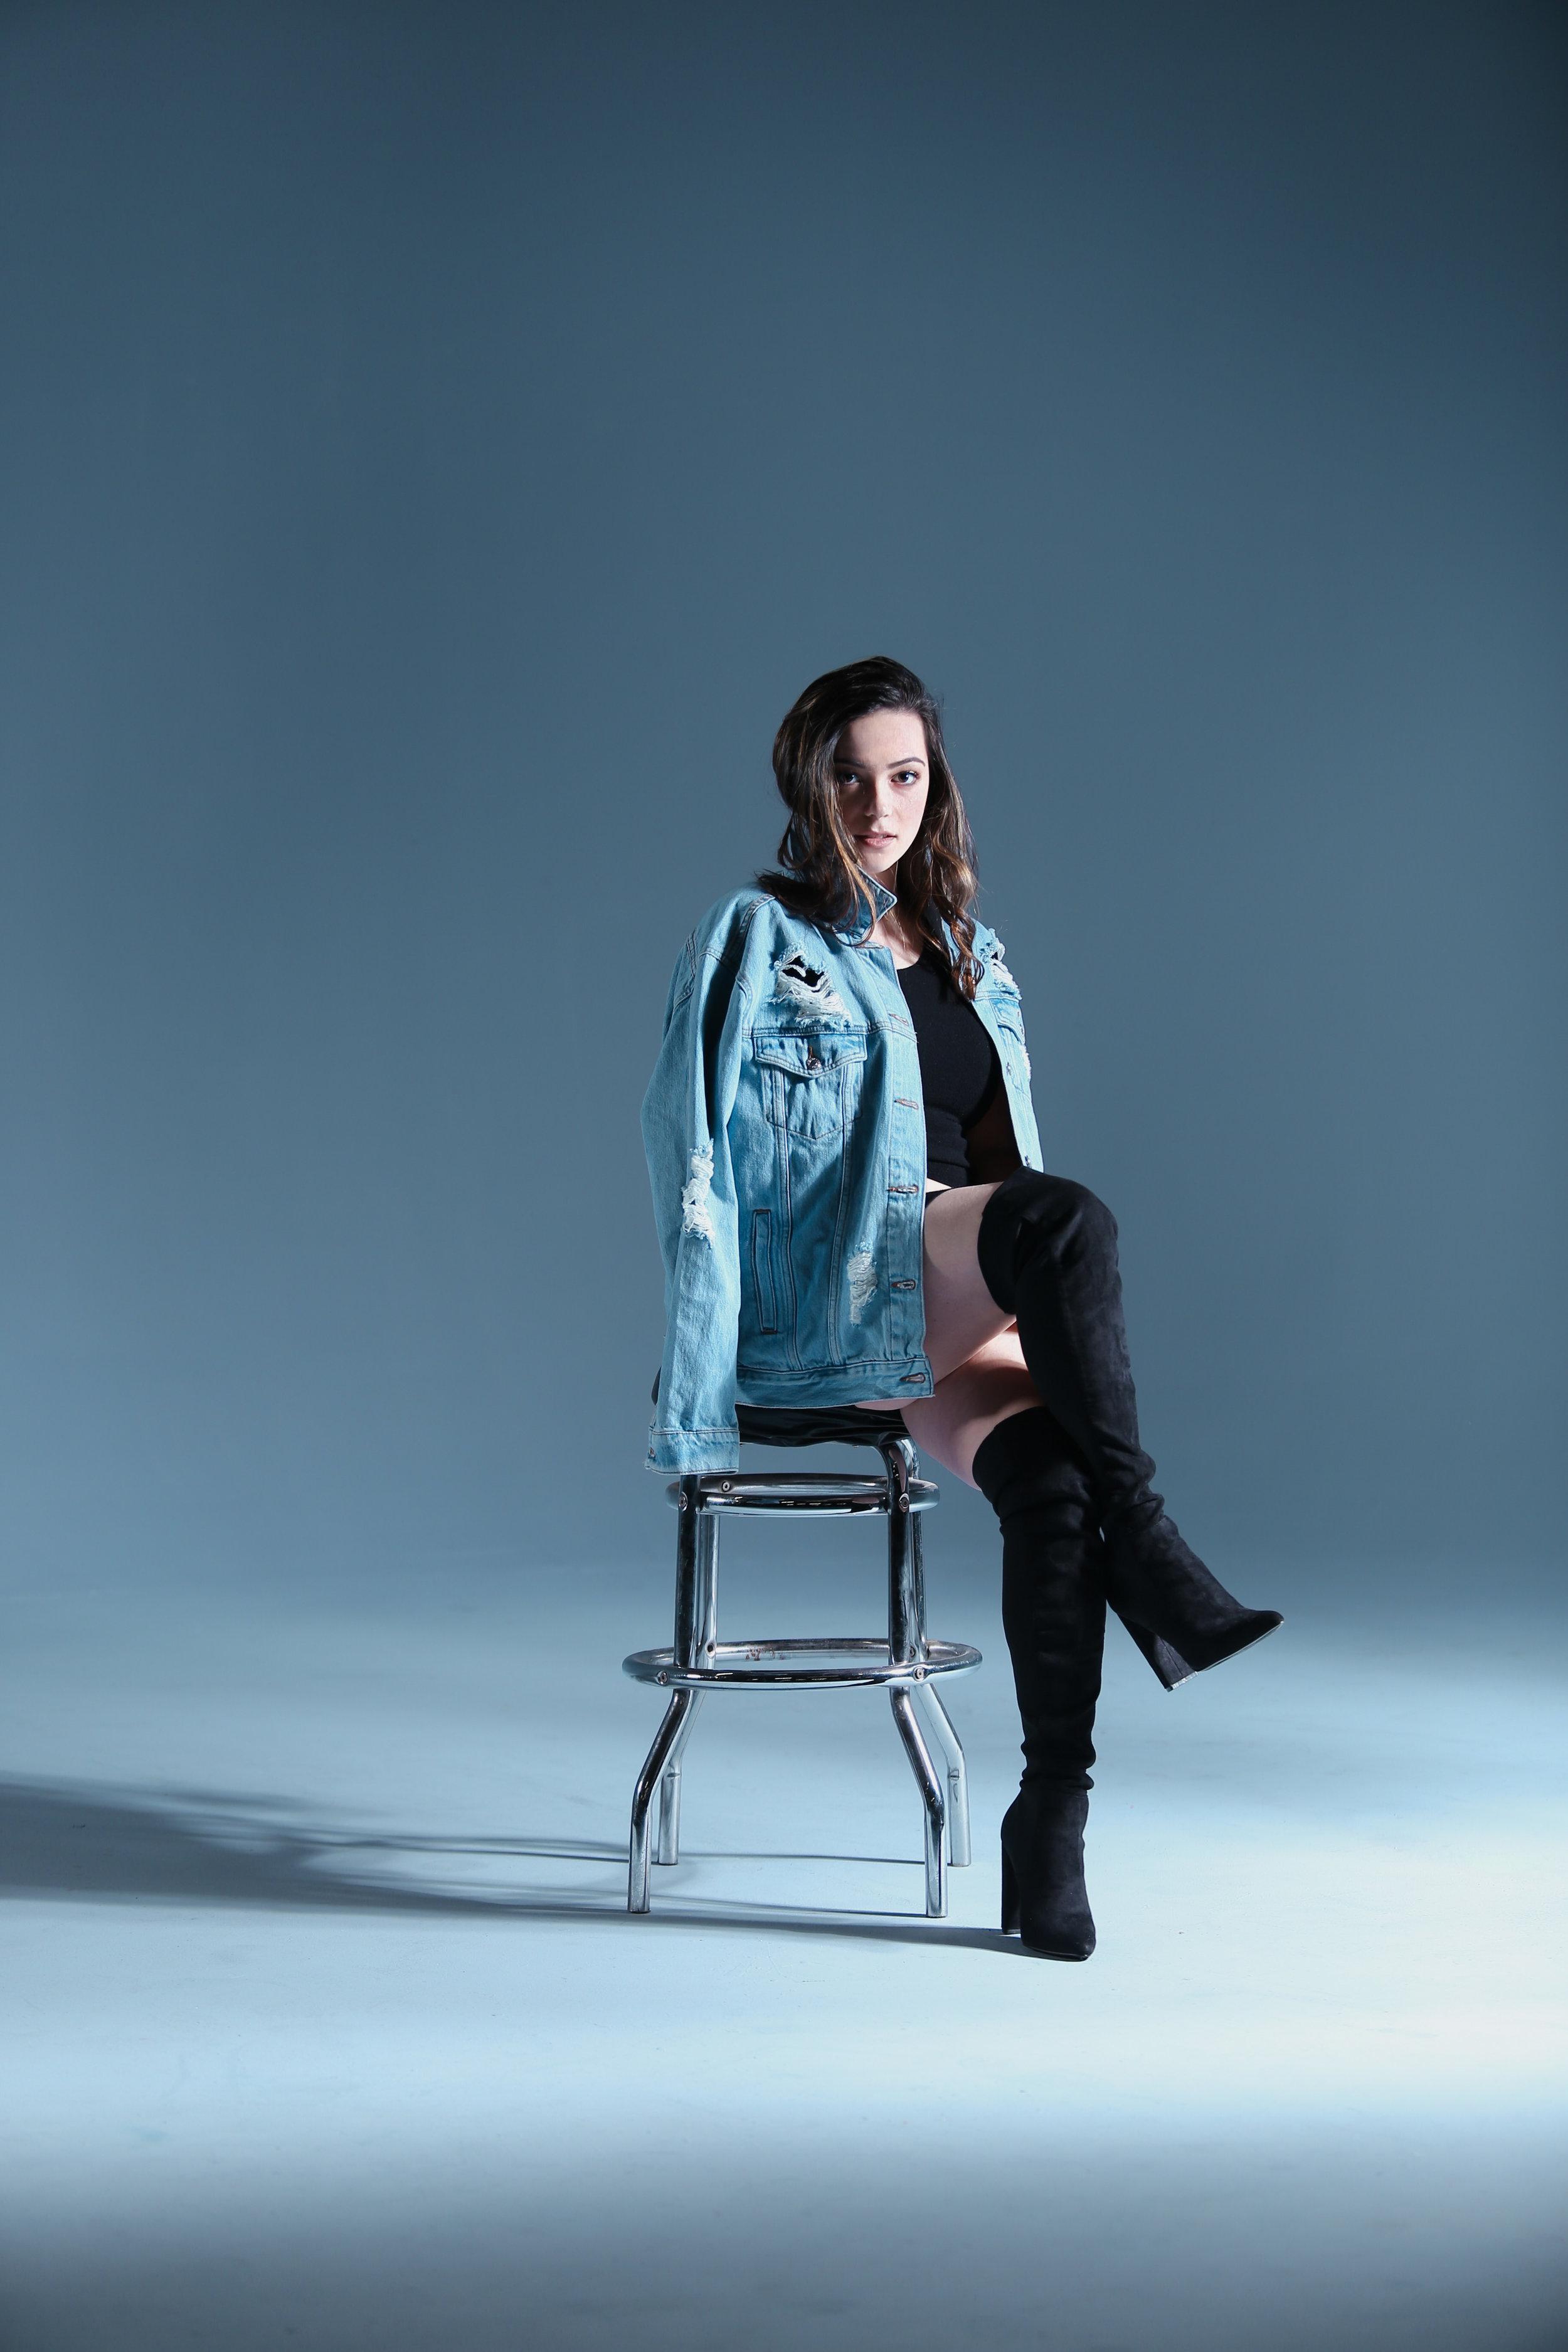 MAURA STREPPA - SINGER/SONGWRITER